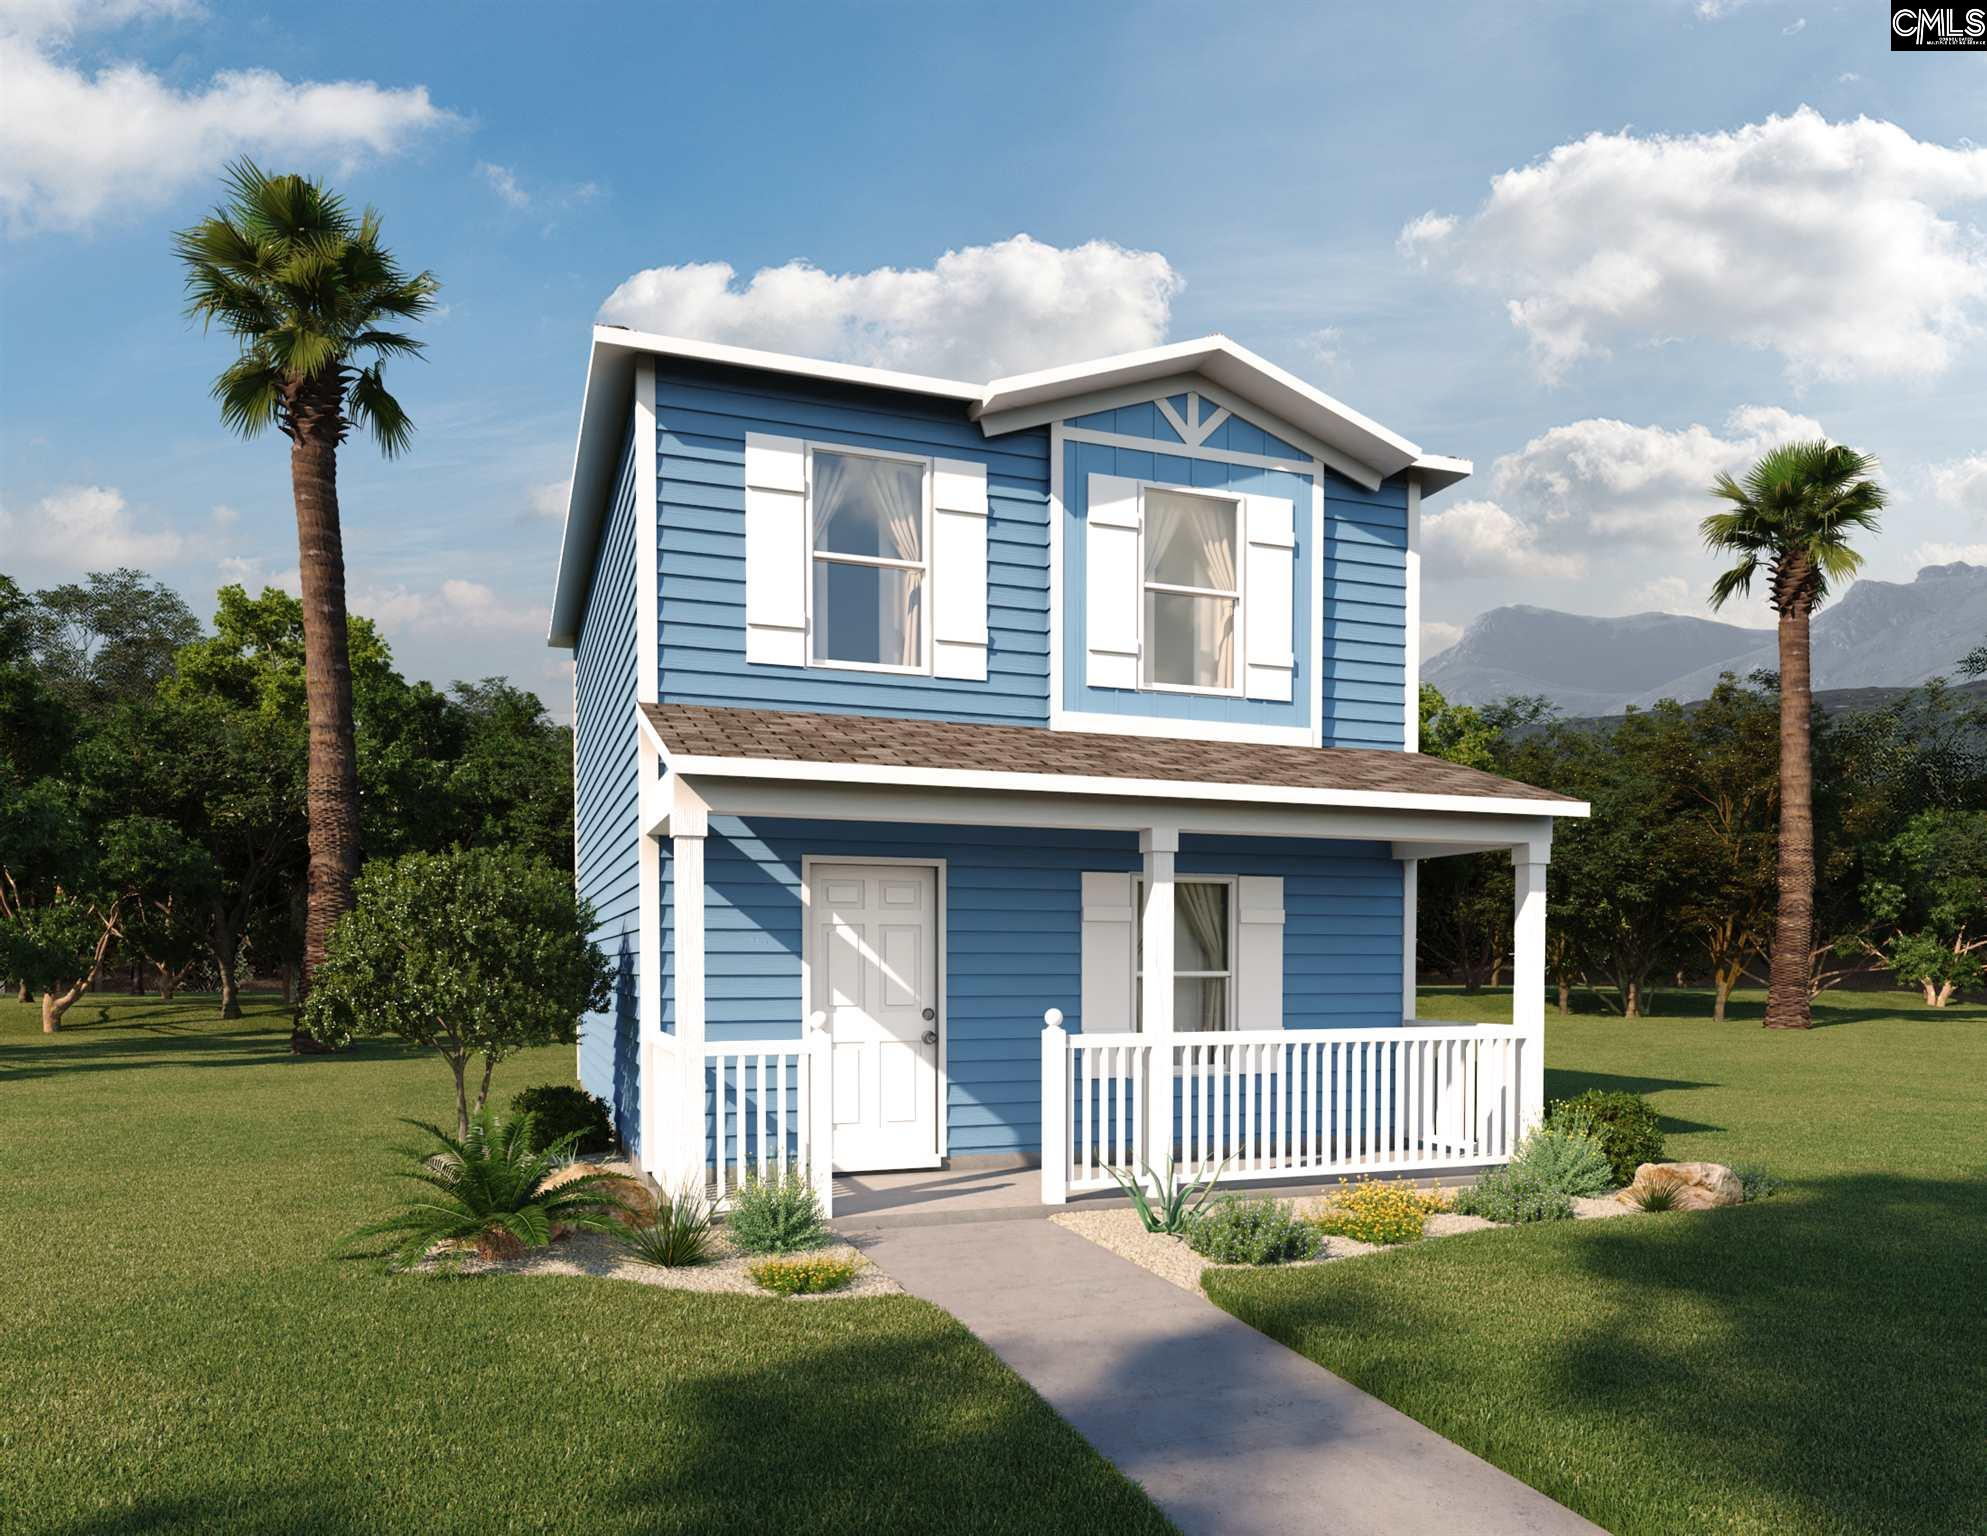 Super Columbia Sc Homes For Sale Between 100 000 And 150 000 Interior Design Ideas Tzicisoteloinfo